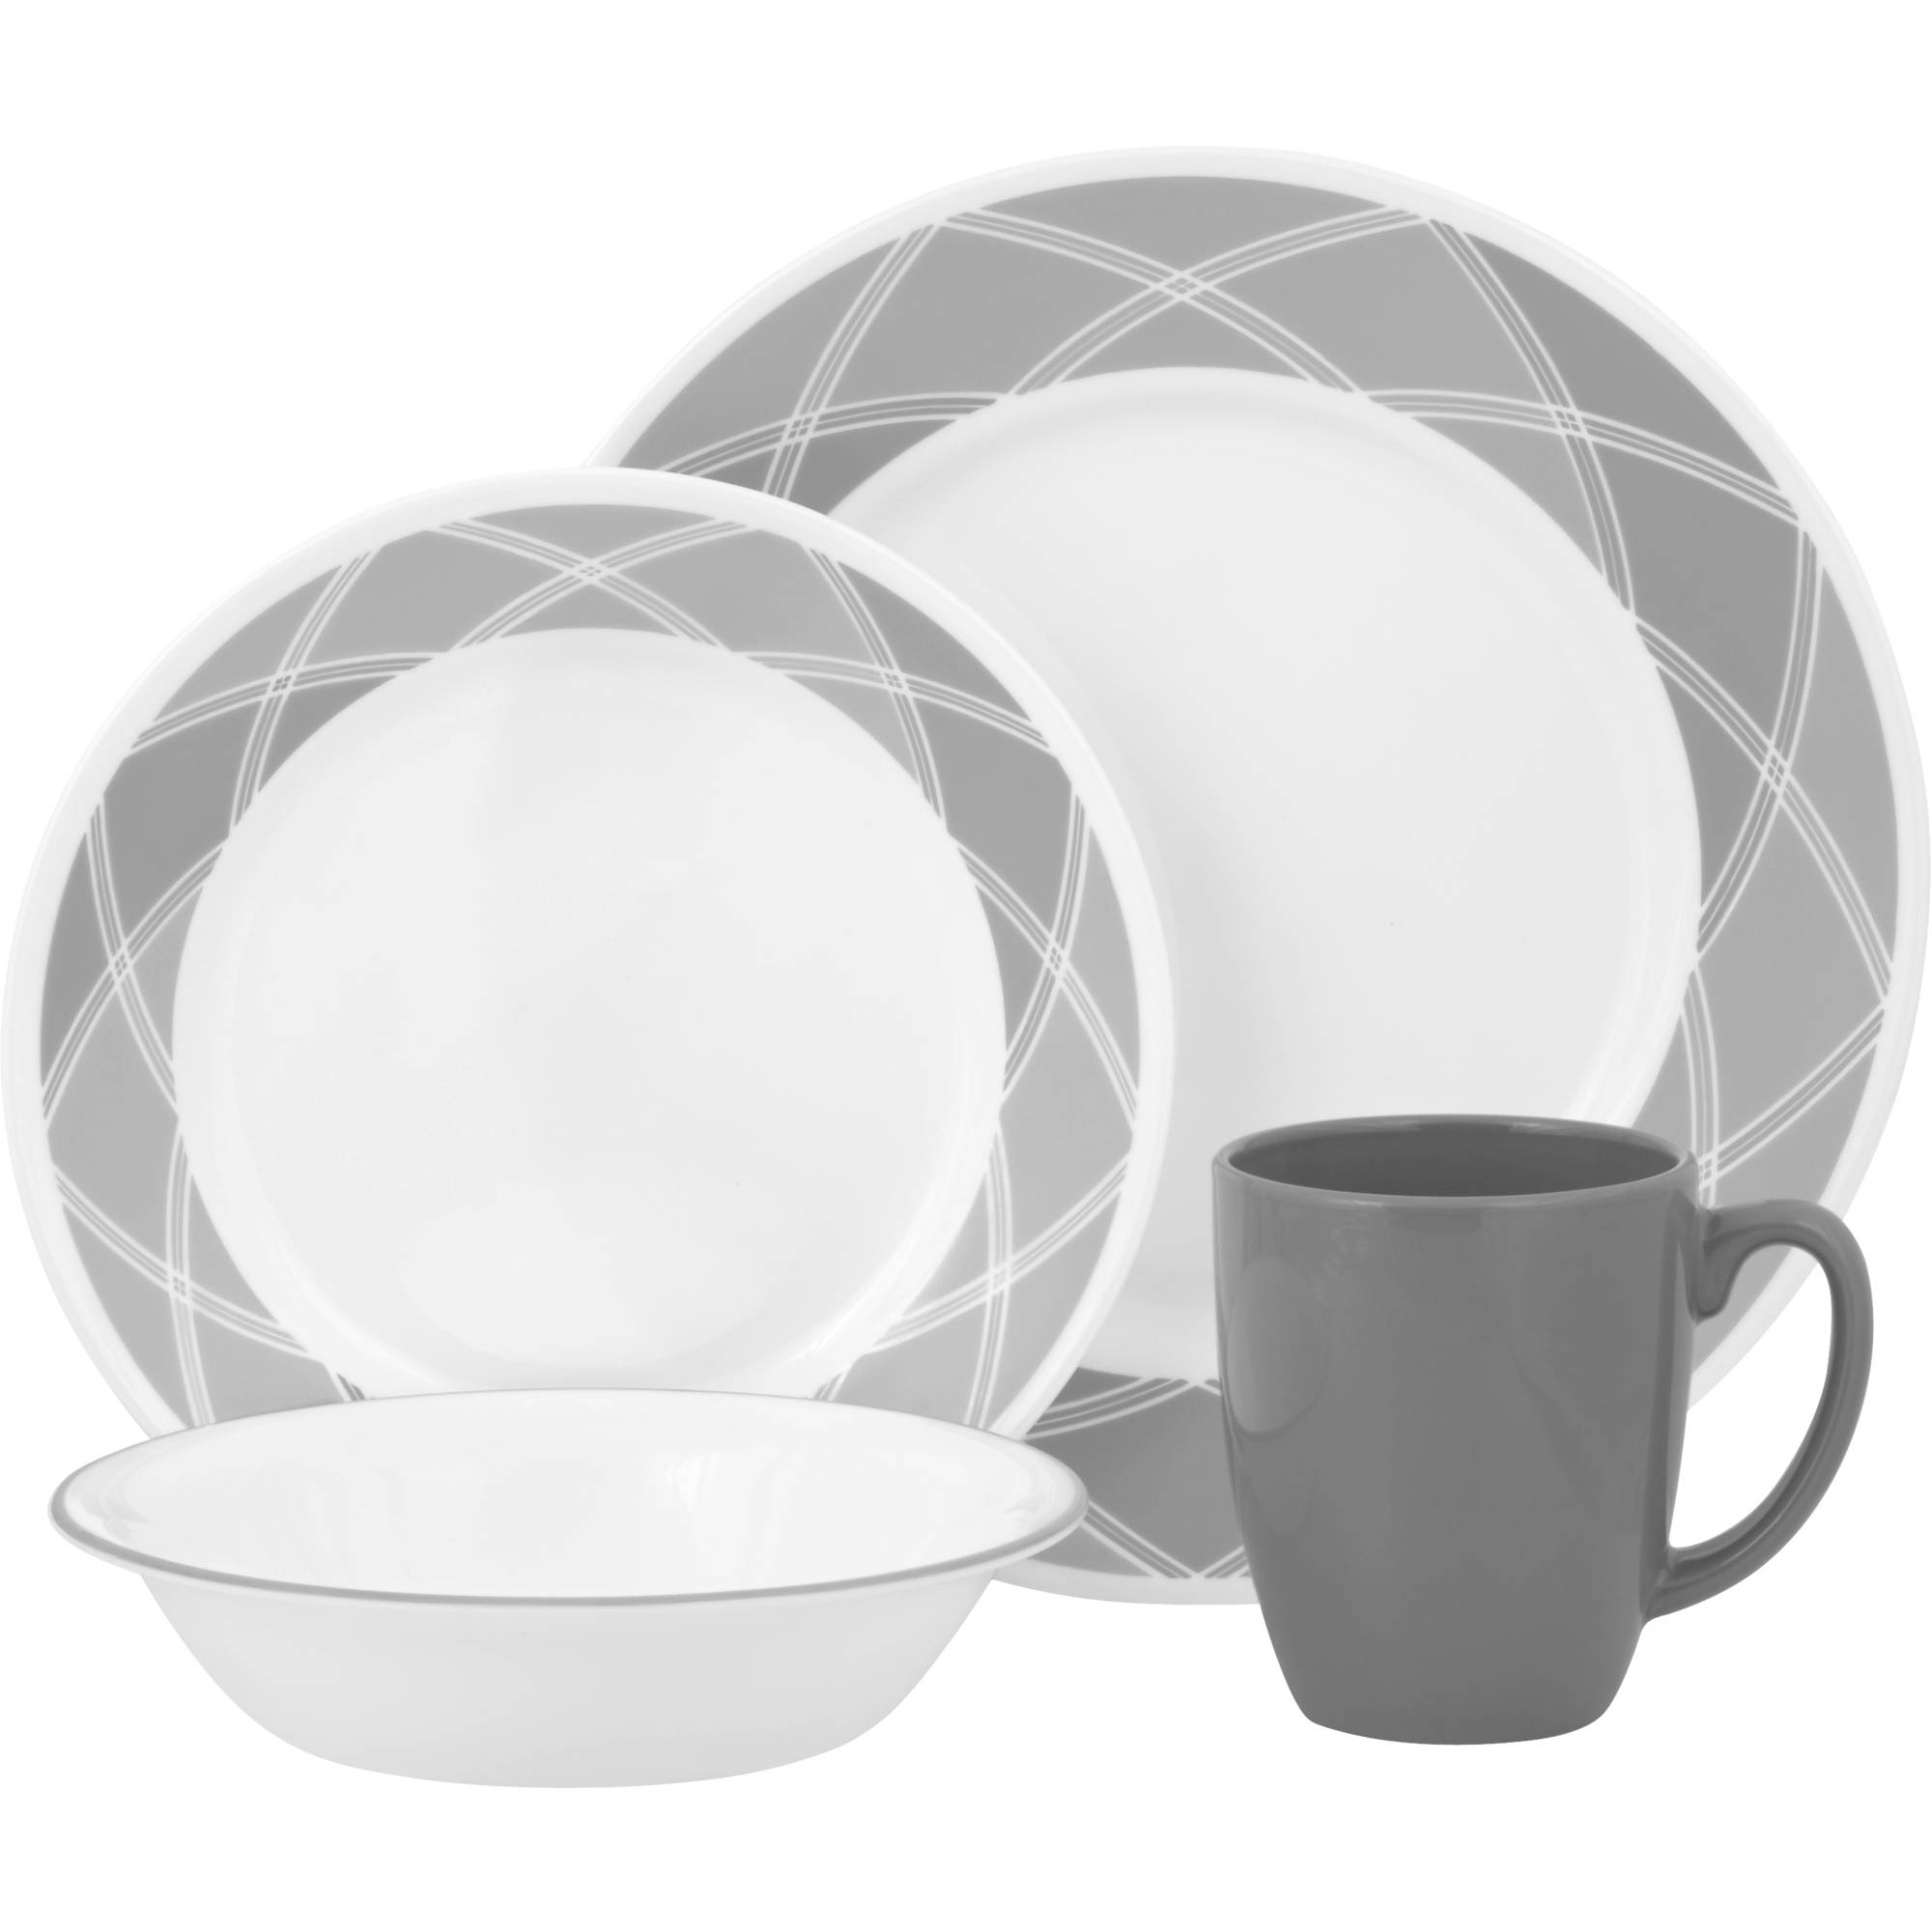 Corelle Vive 16-Piece Dinnerware Set, Savvy Shades Gray